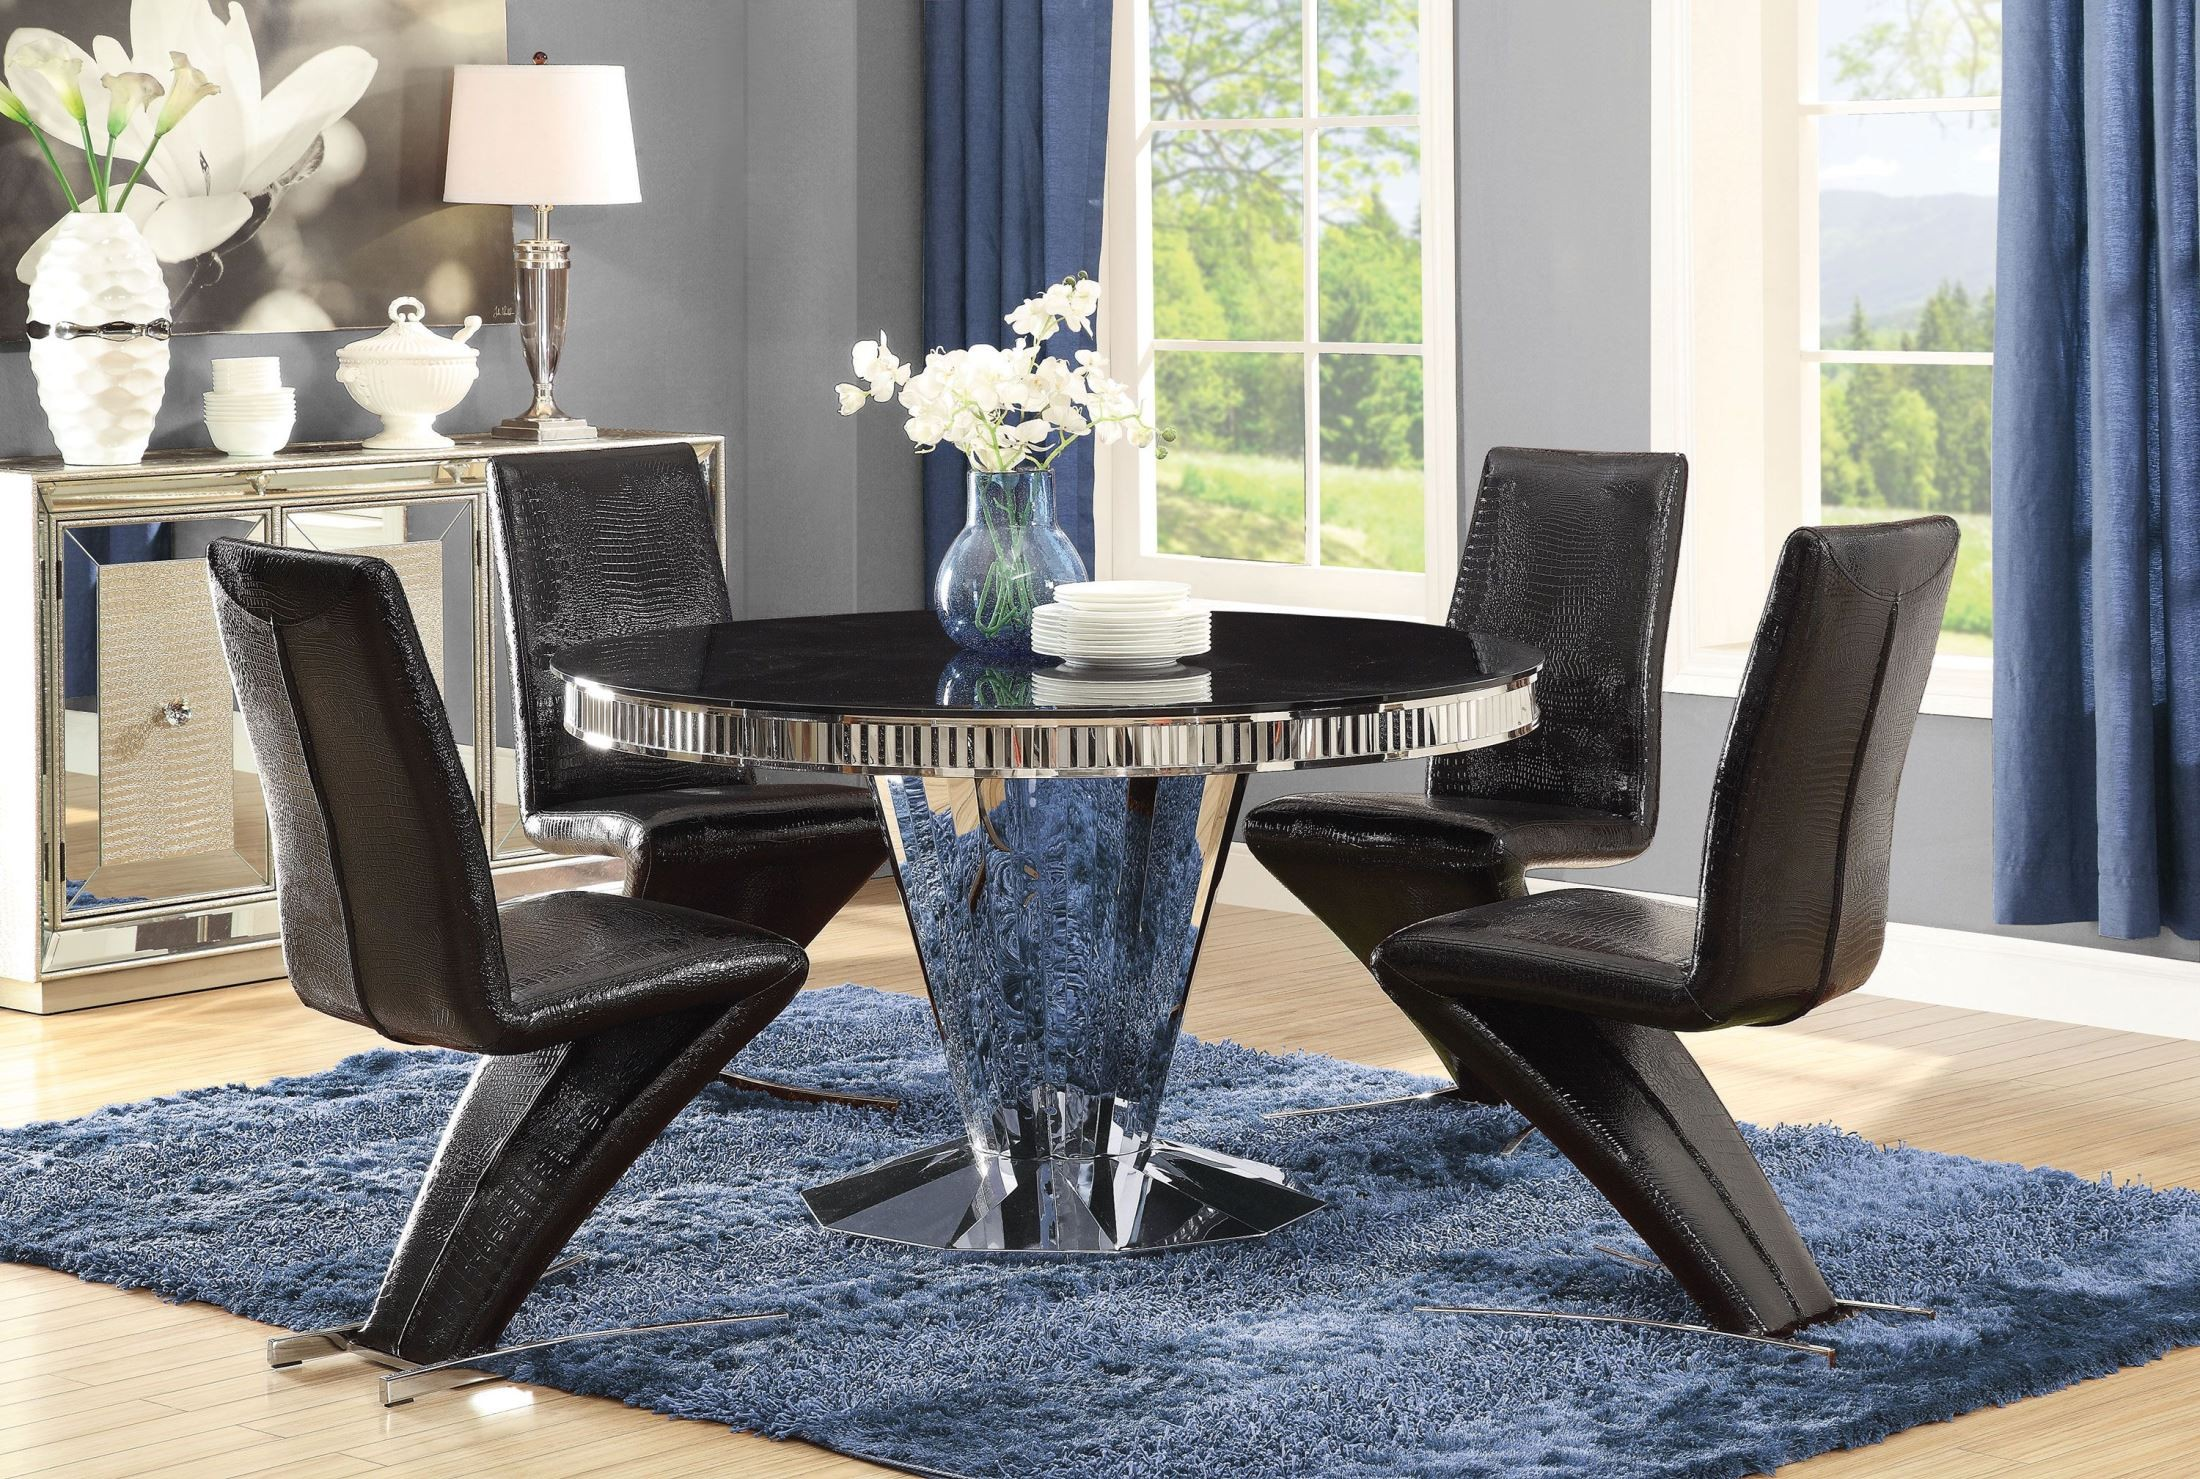 FurnitureETC   Furniture & More Barzini Stainless Steel Dining Room ...